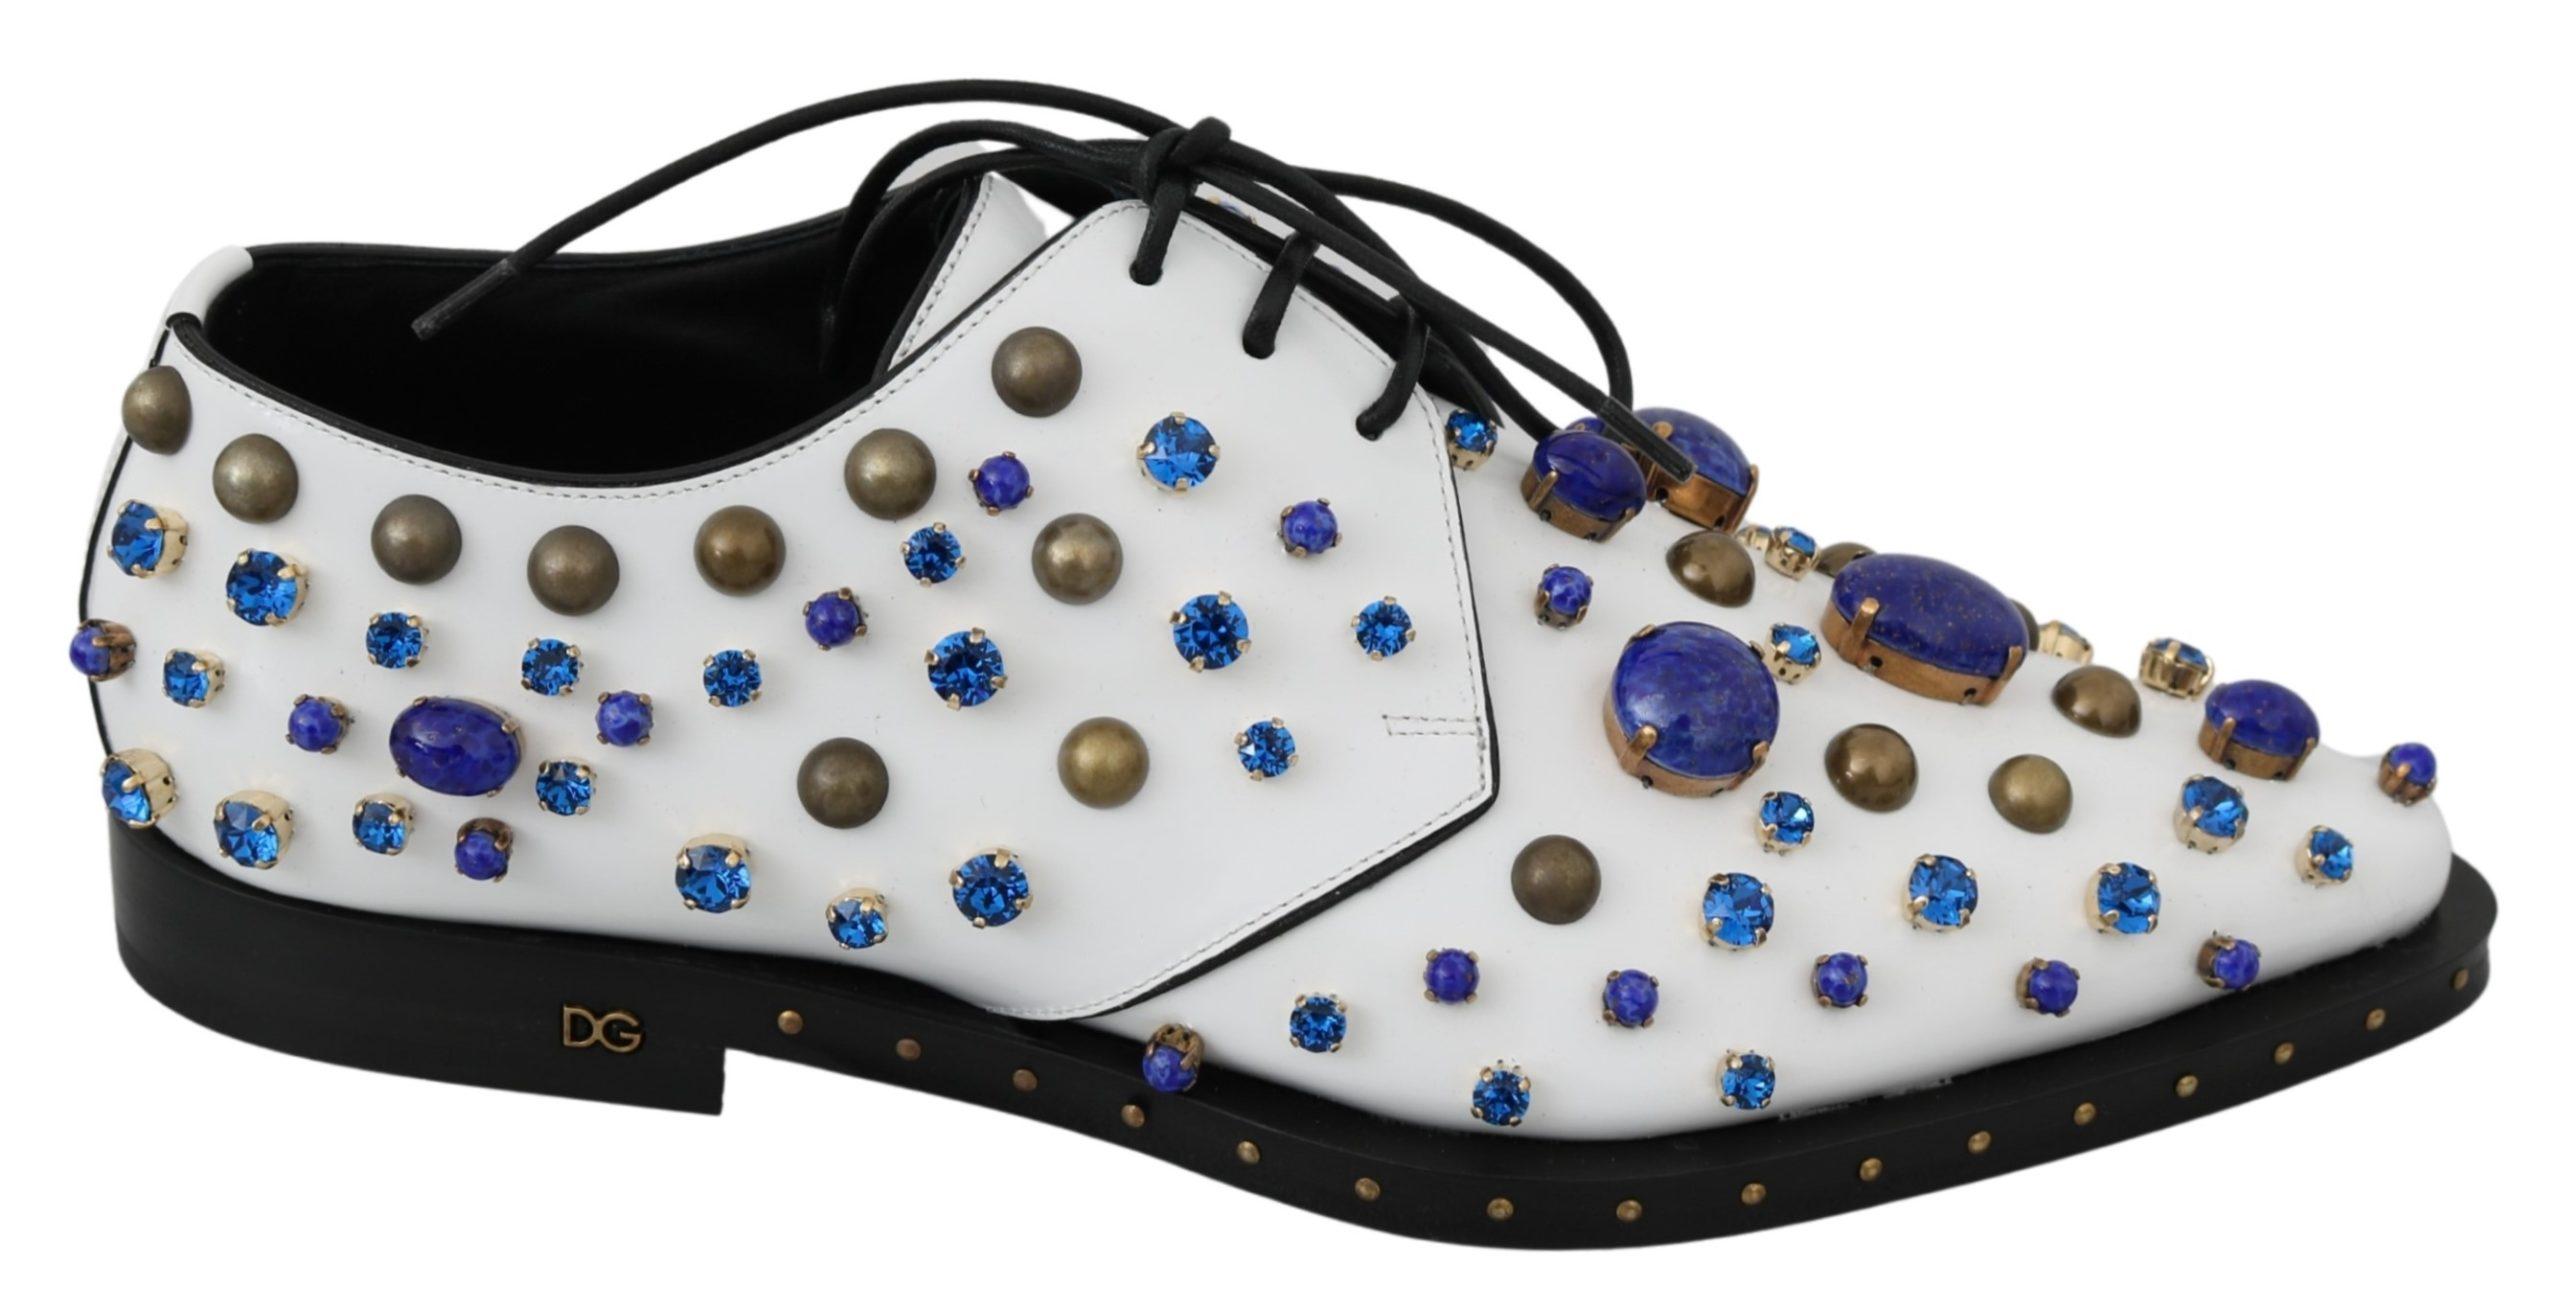 Dolce & Gabbana Women's Leather Crystals Dress Broque Shoe White LA7214 - EU39/US8.5